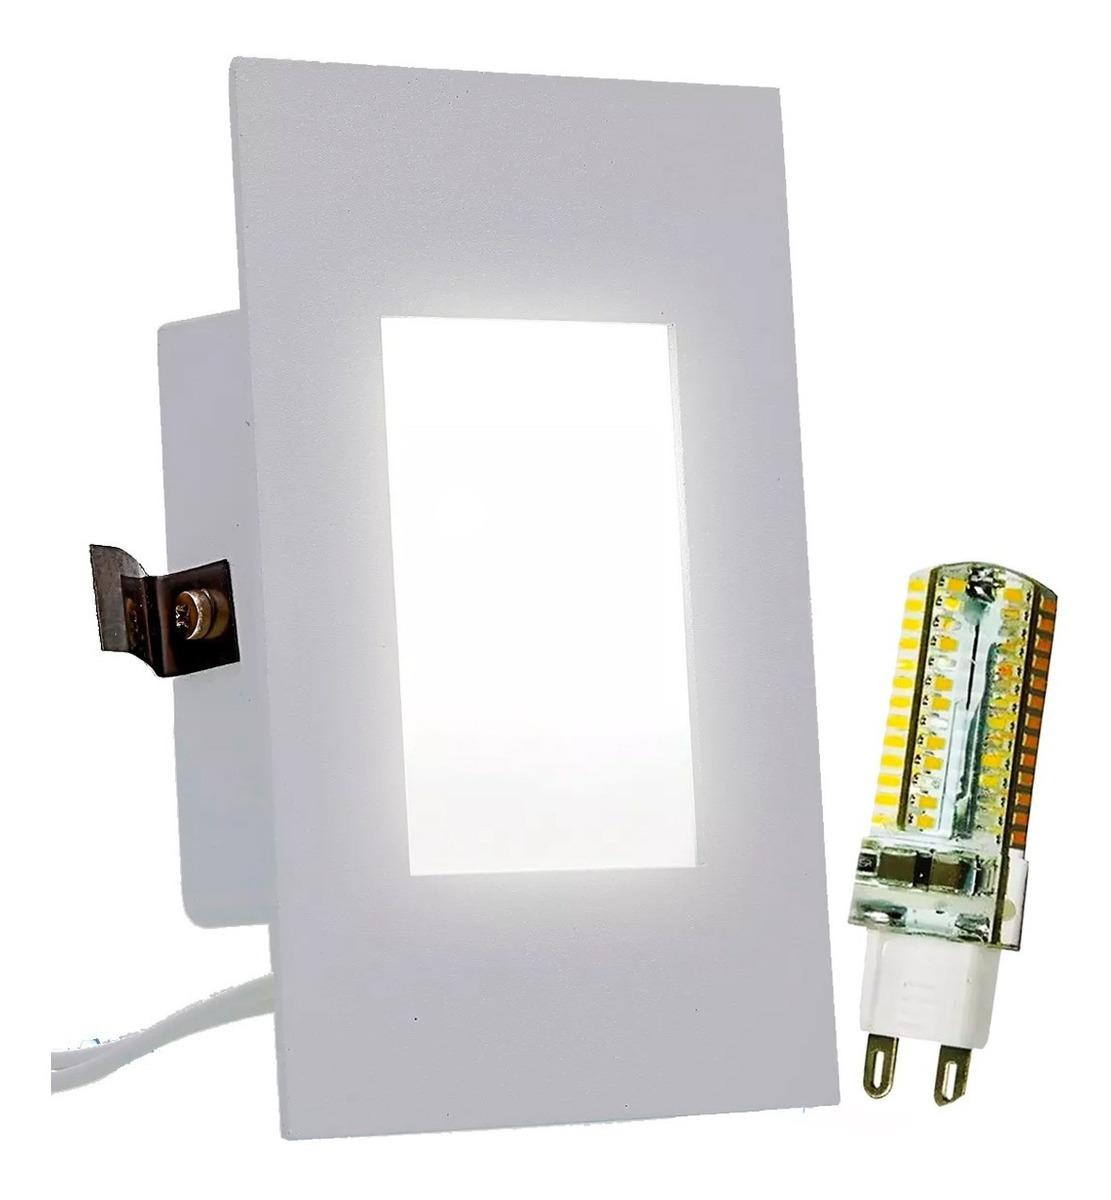 Kit Balizador Embutir 4x2 P Escada Corredor Lampada Led G9 R